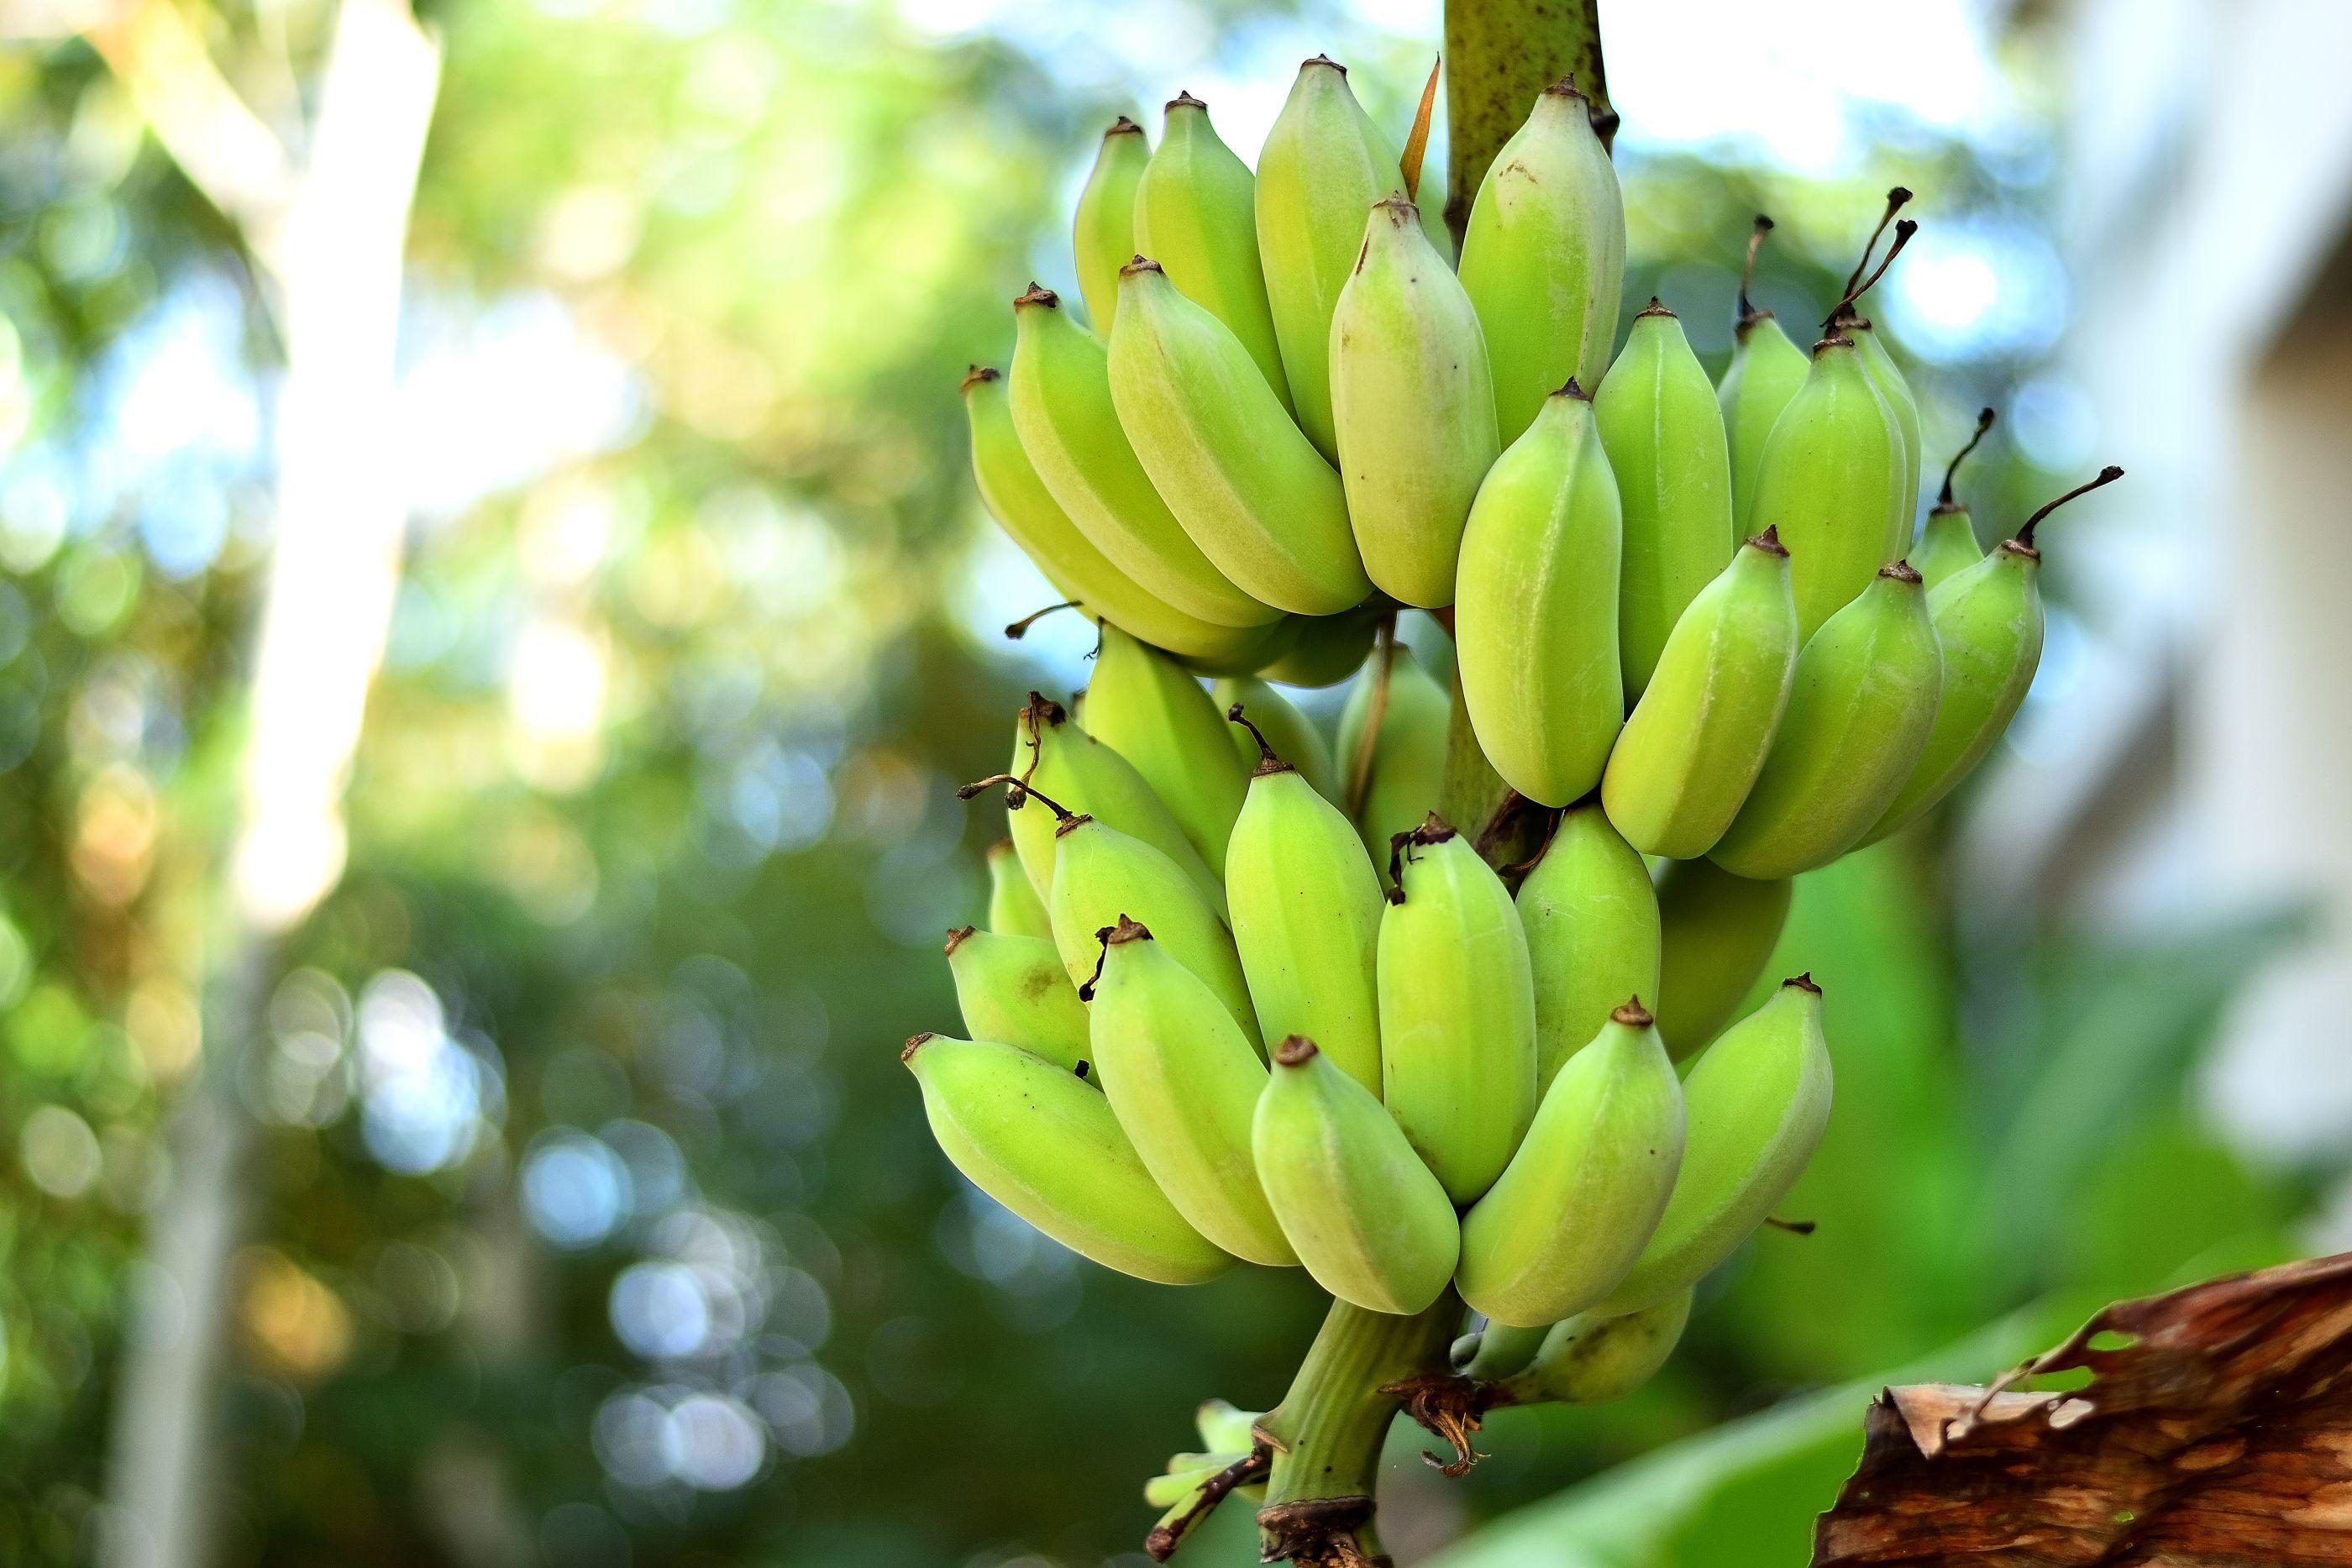 close up of bananas 5ade1aaa642dca c2da